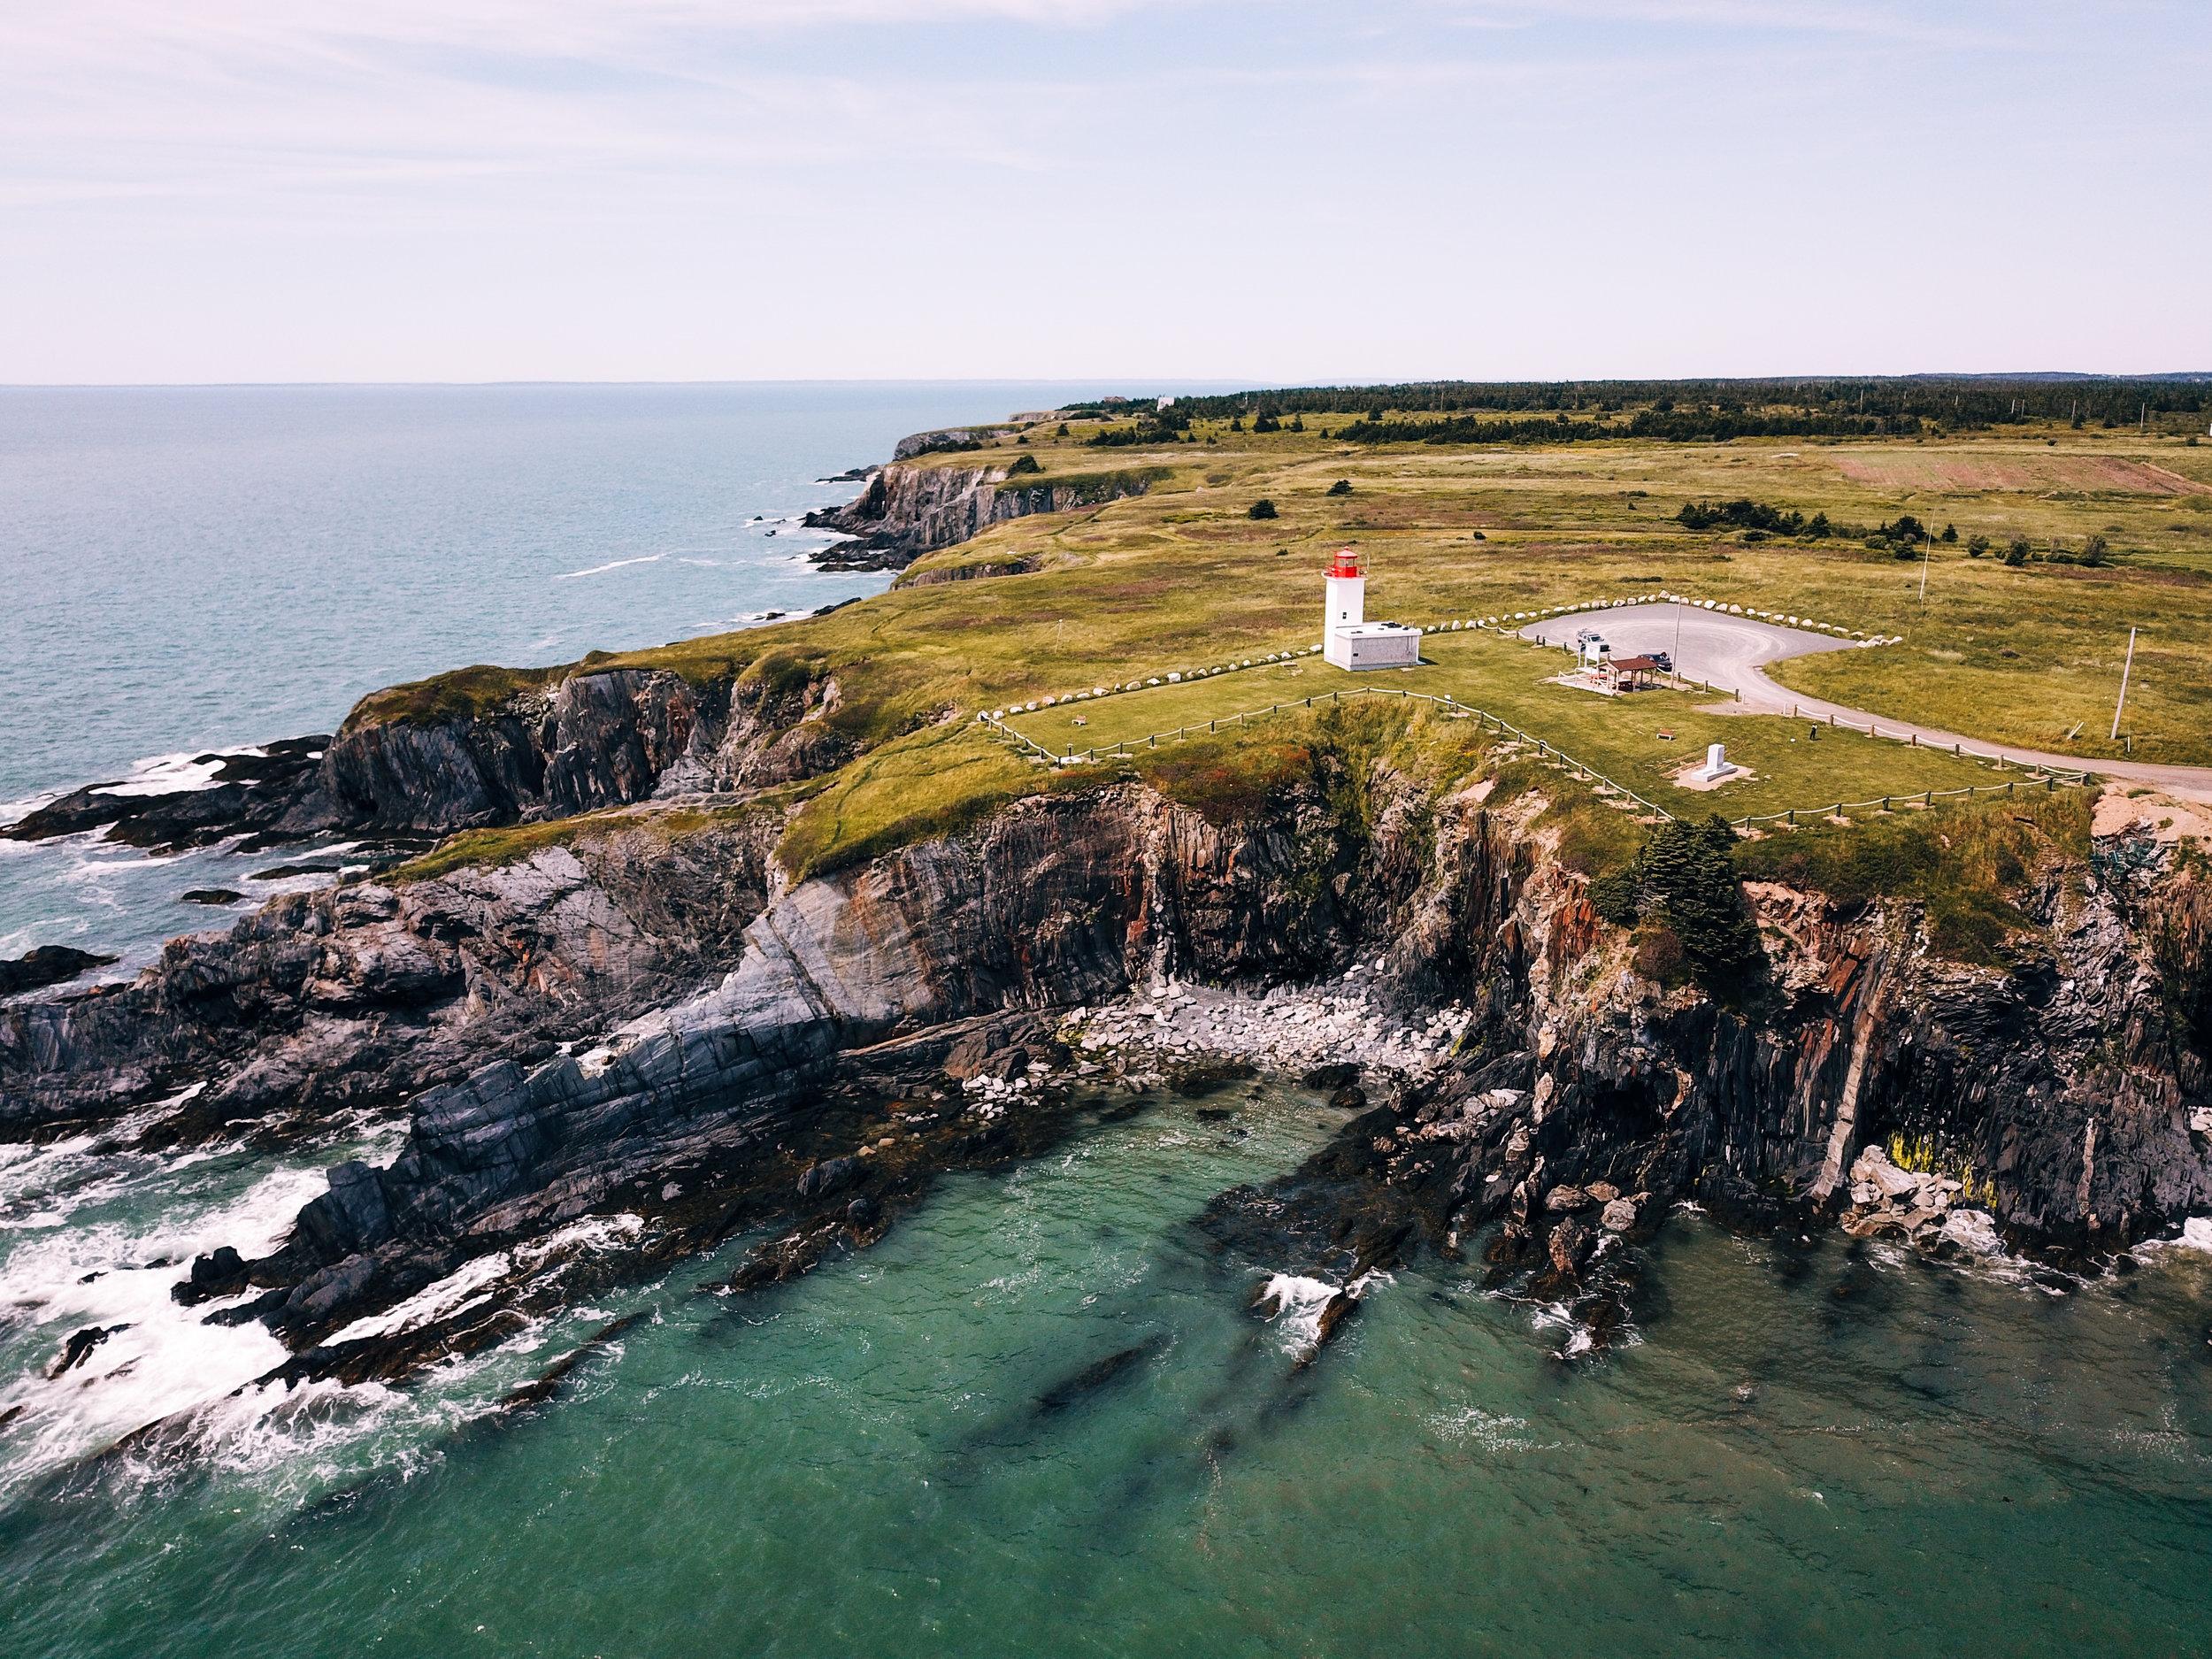 Drone shot of Mavillette Beach in Nova Scotia by Hailey